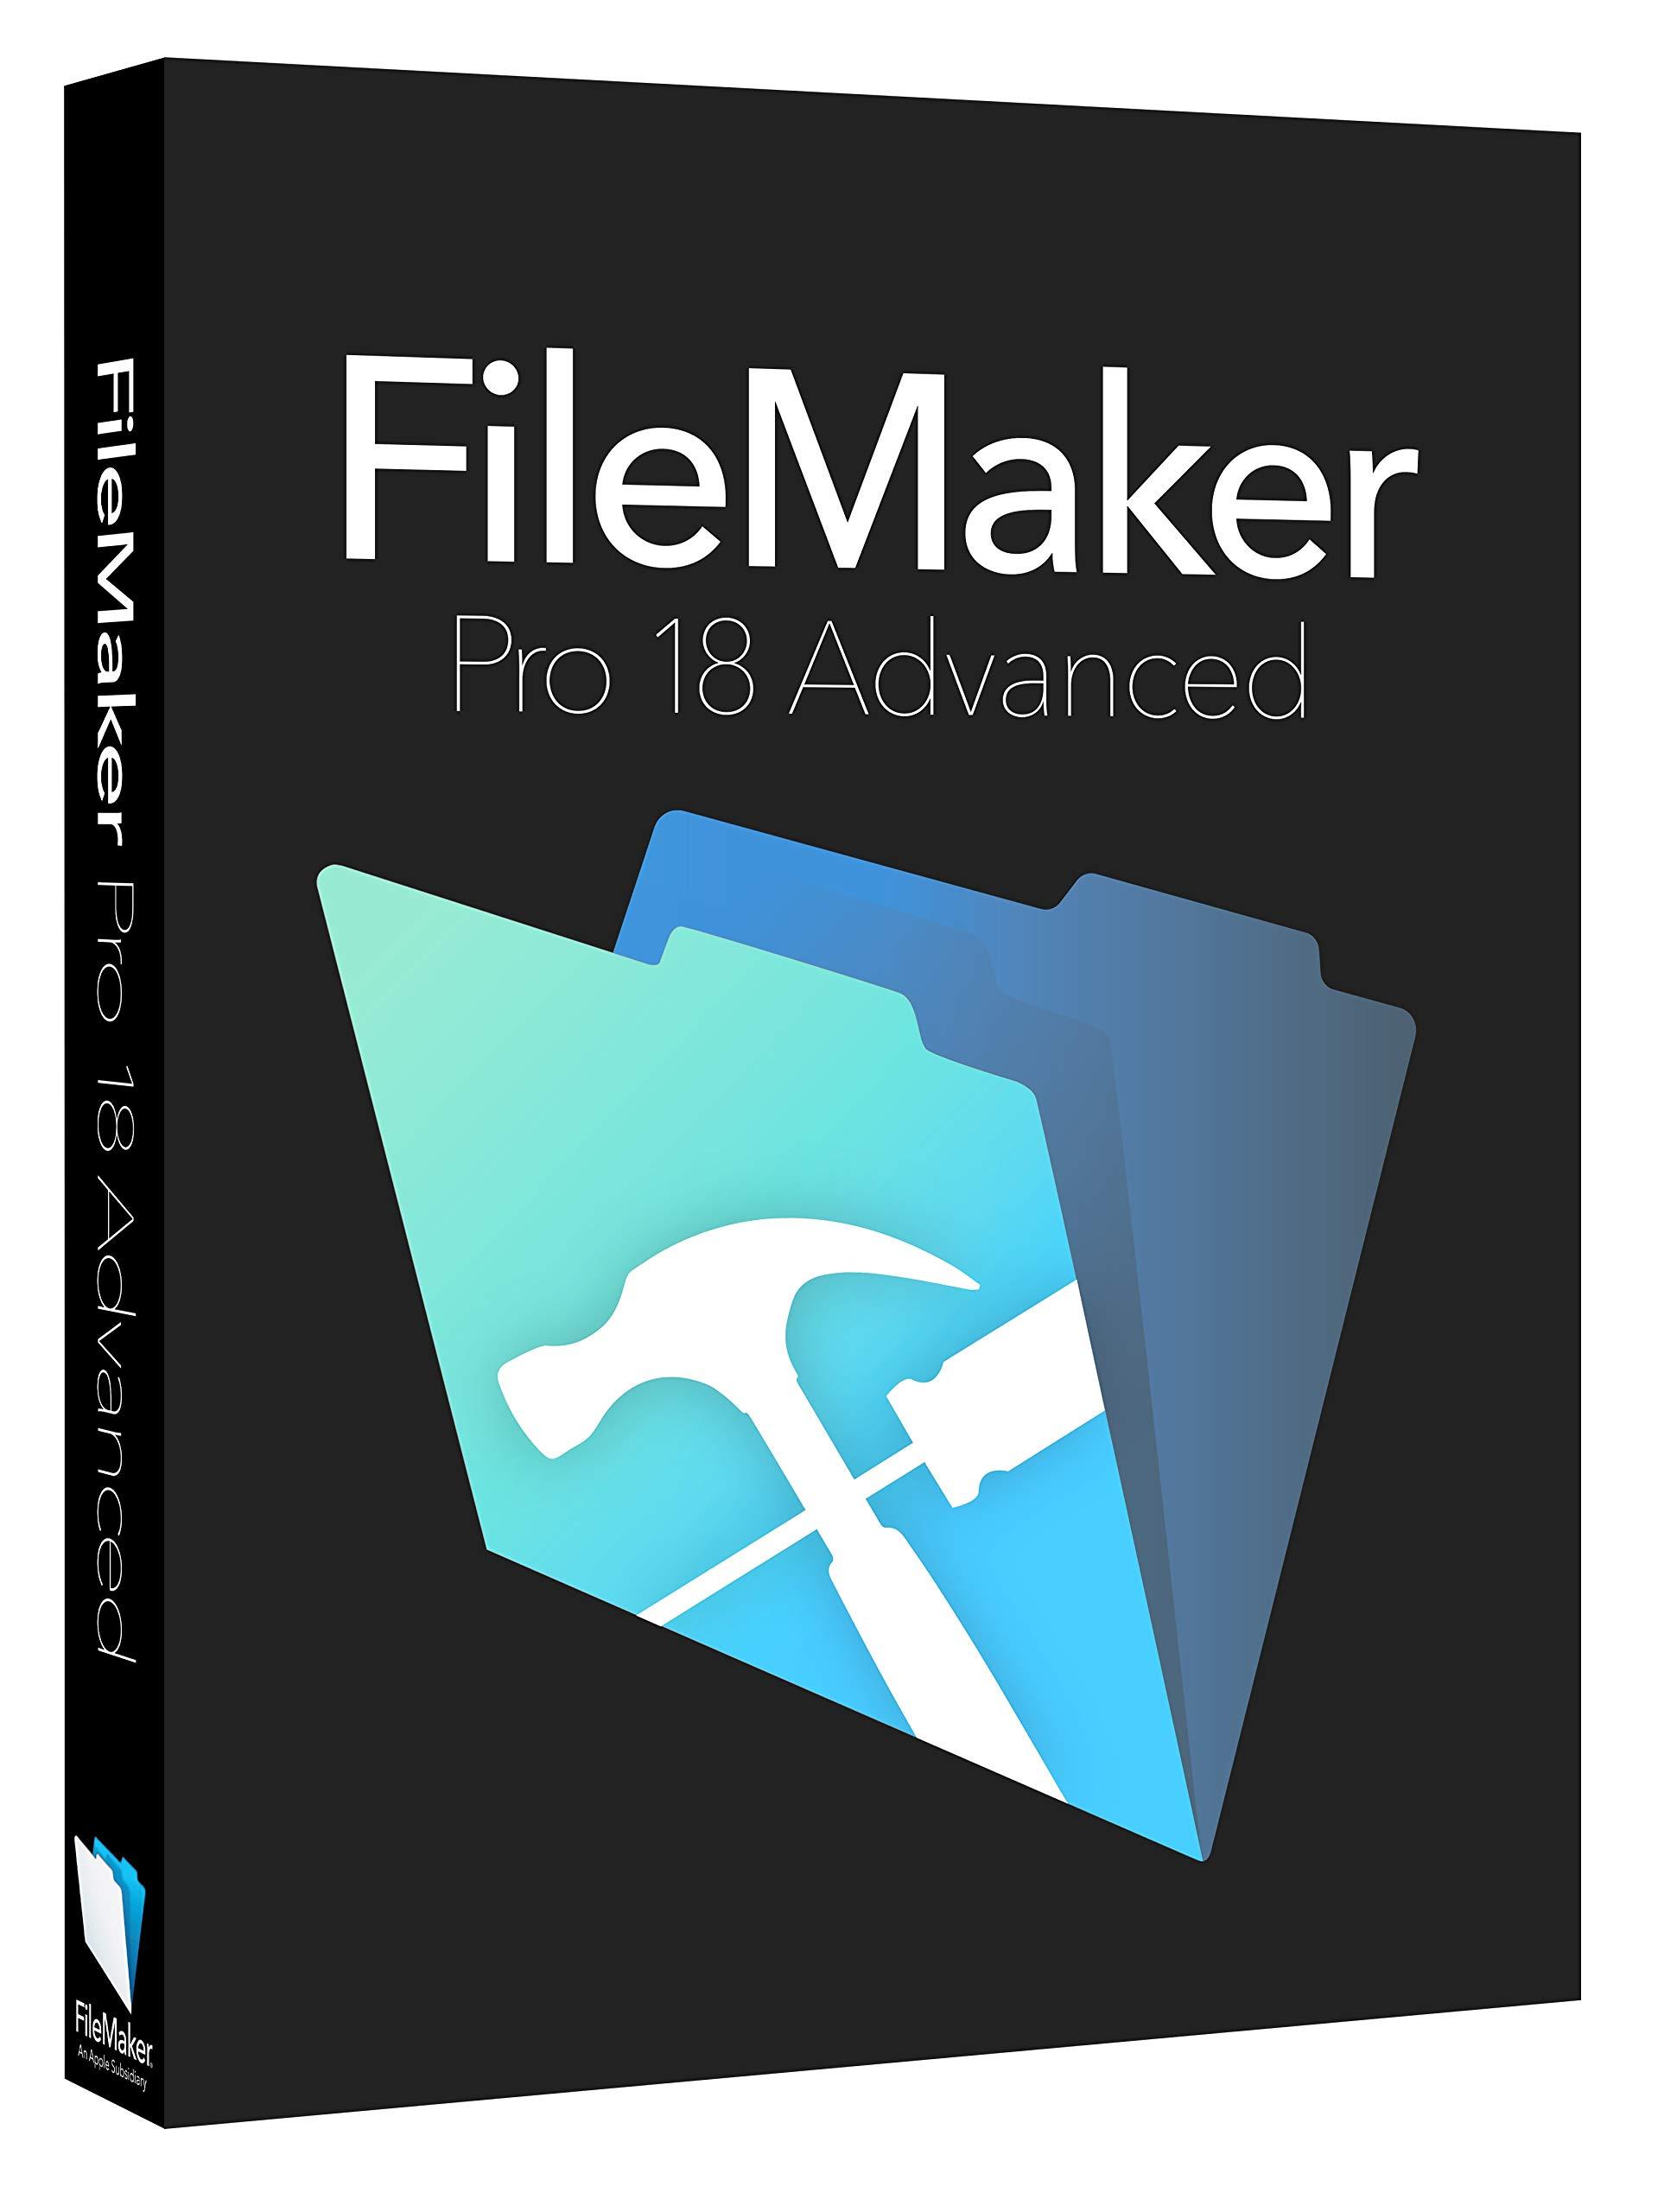 FileMaker Pro 18 Advanced Education Mac/Win V18 by Filemaker